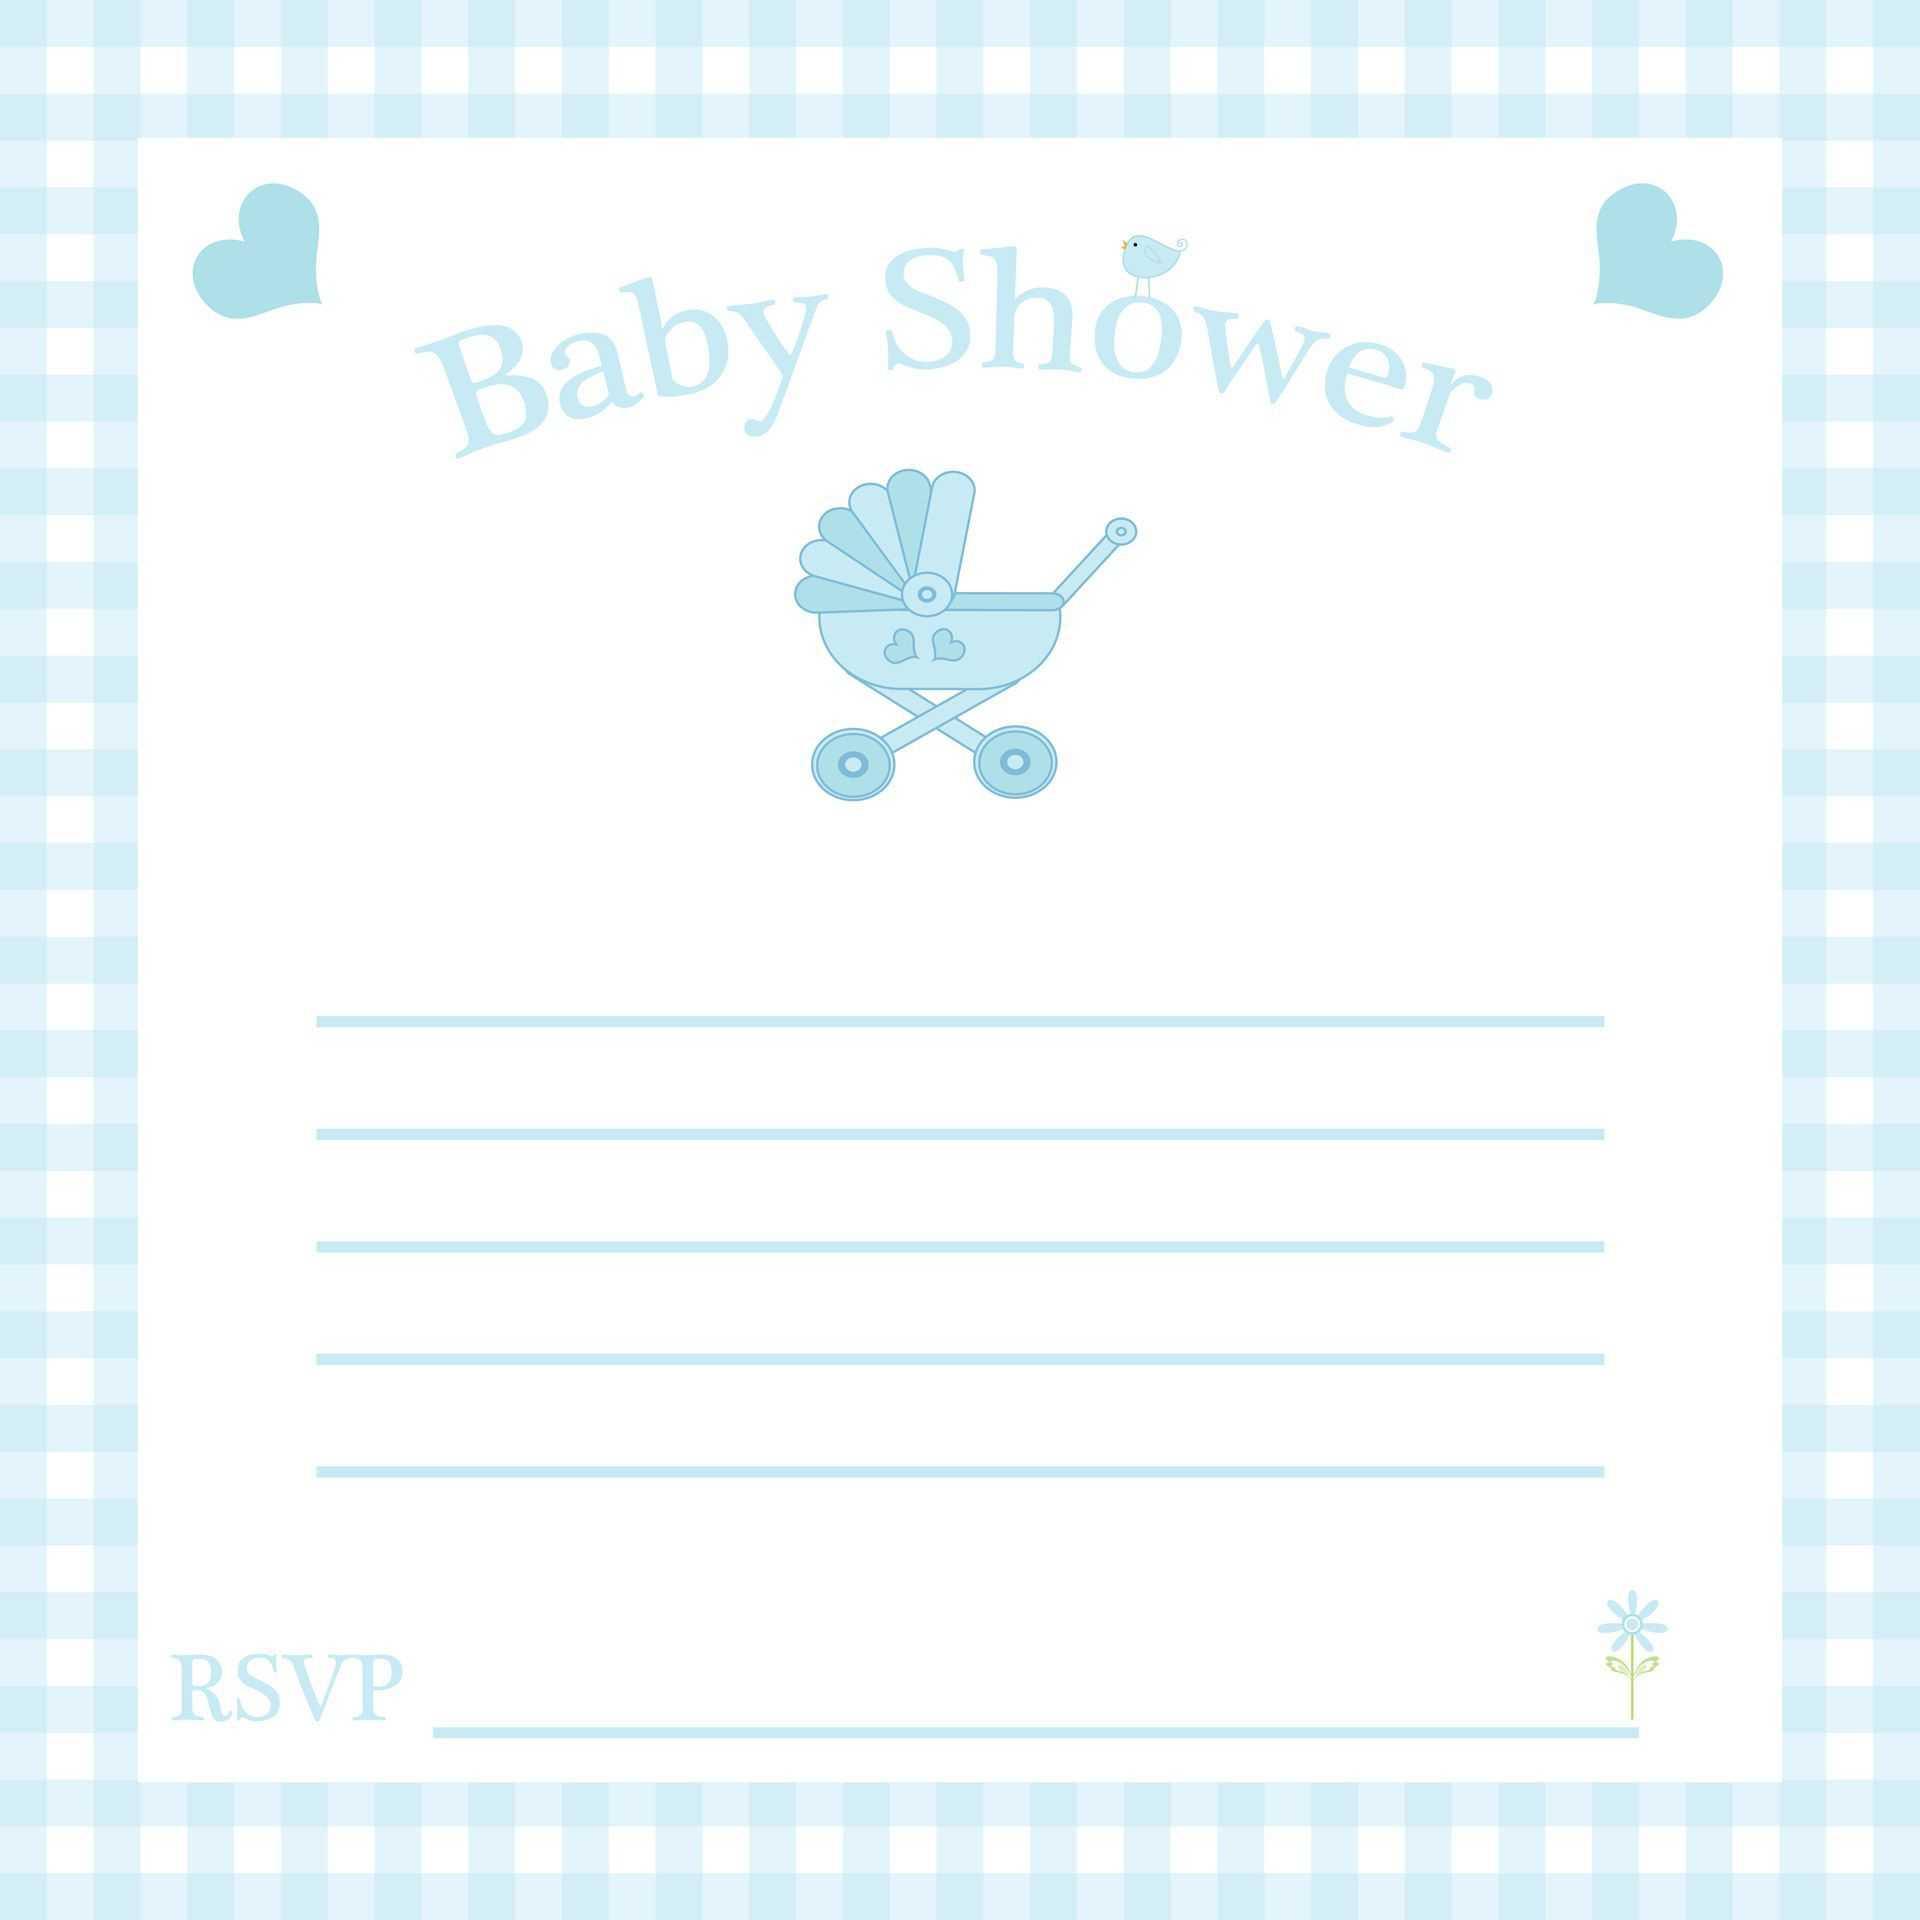 Graduation Party : Free Baby Invitation Template - Card Within Free Baby Shower Invitation Templates Microsoft Word